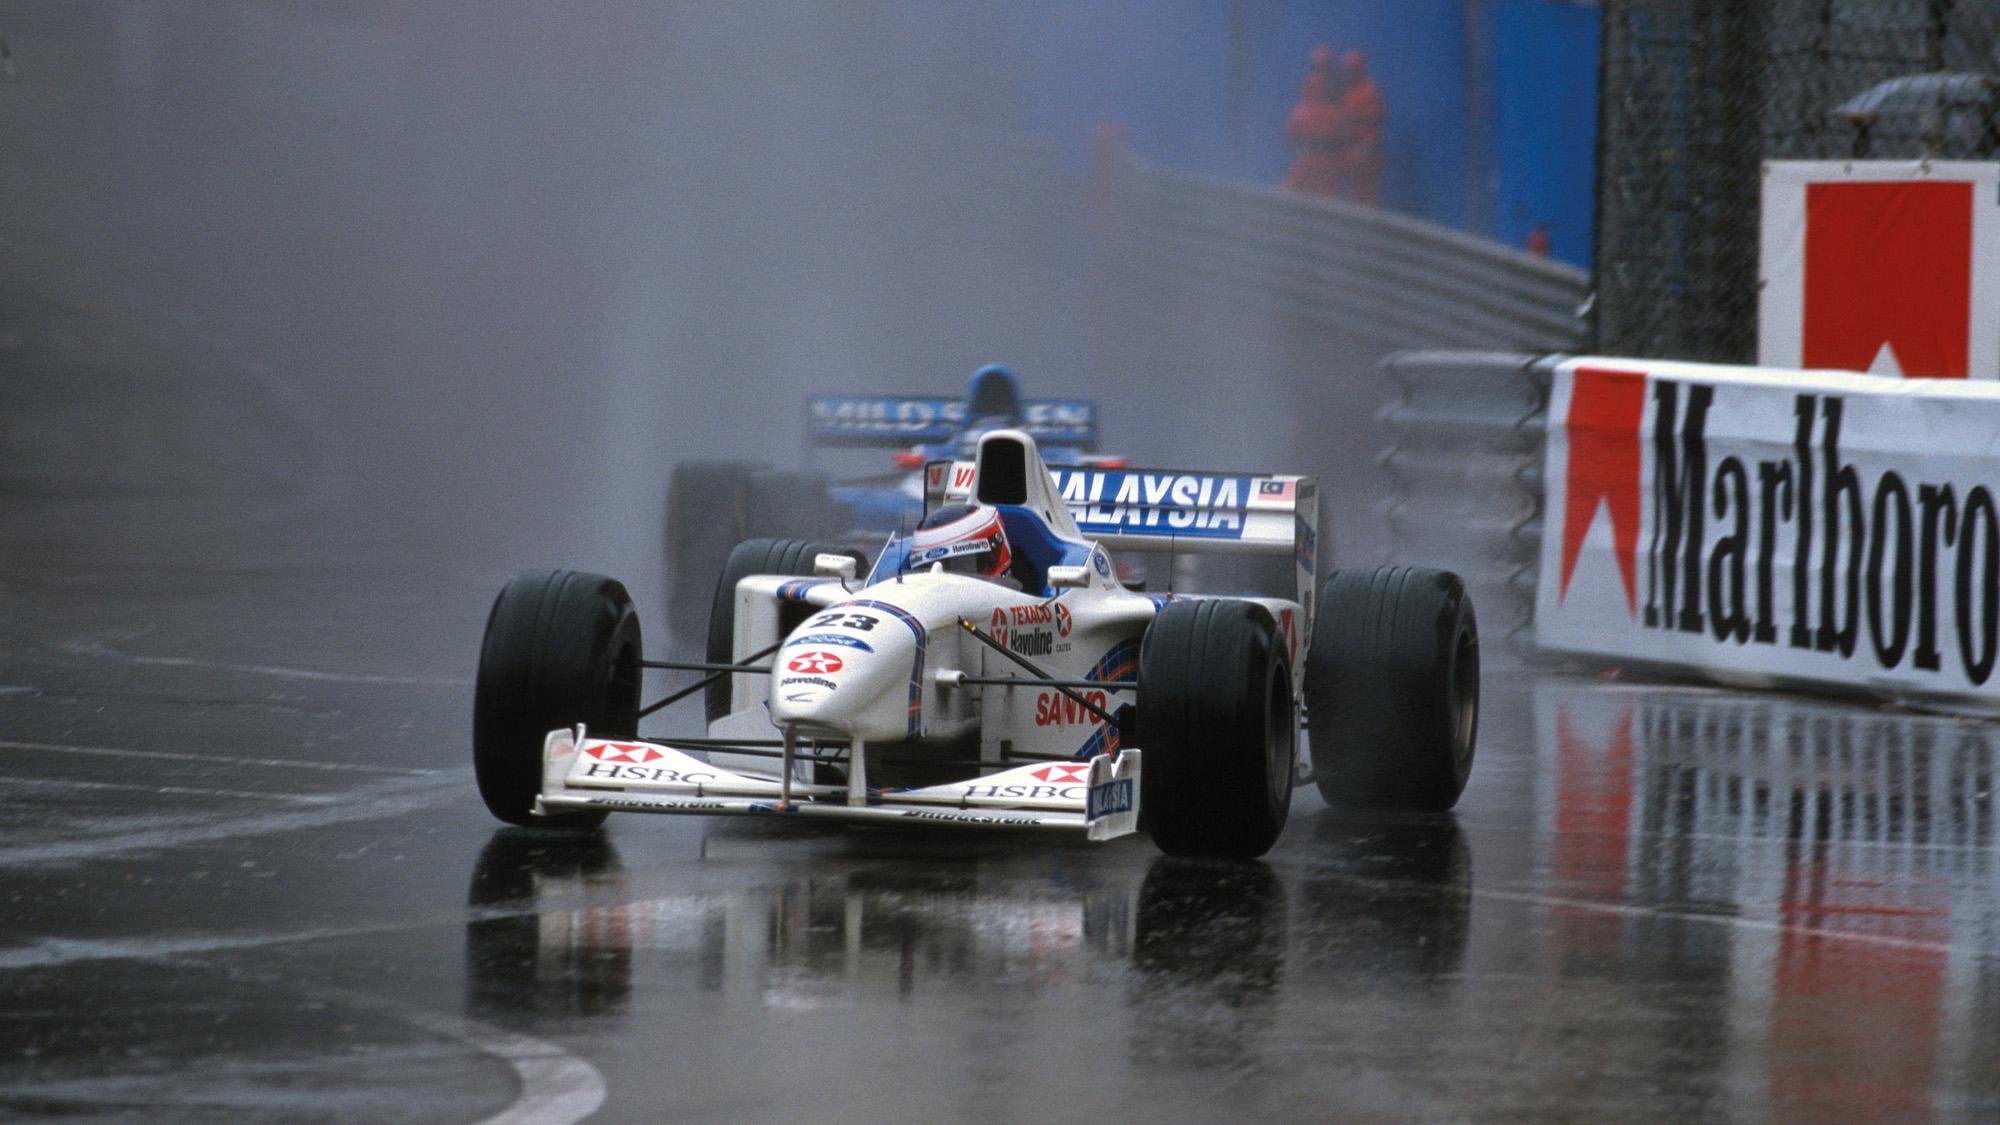 Jan Magnussen in the 1997 Monaco Grand Prix